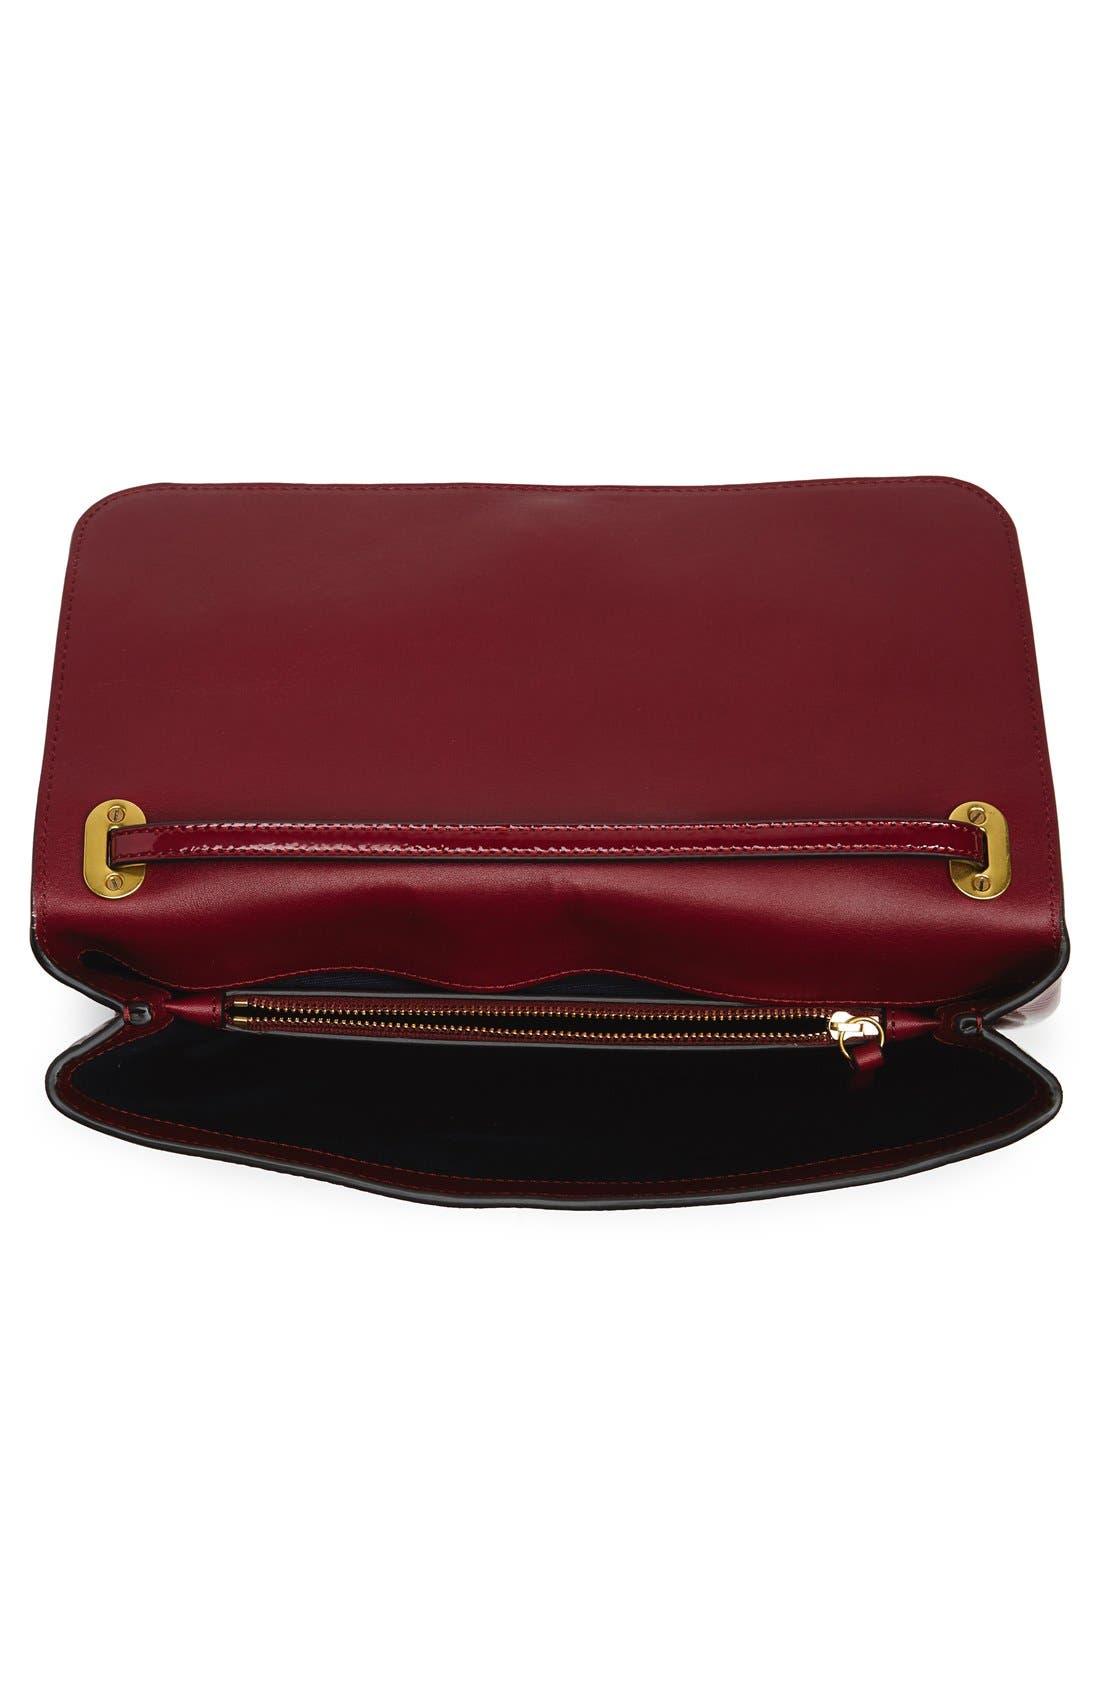 Patent Leather Convertible Shoulder Bag,                             Alternate thumbnail 3, color,                             606